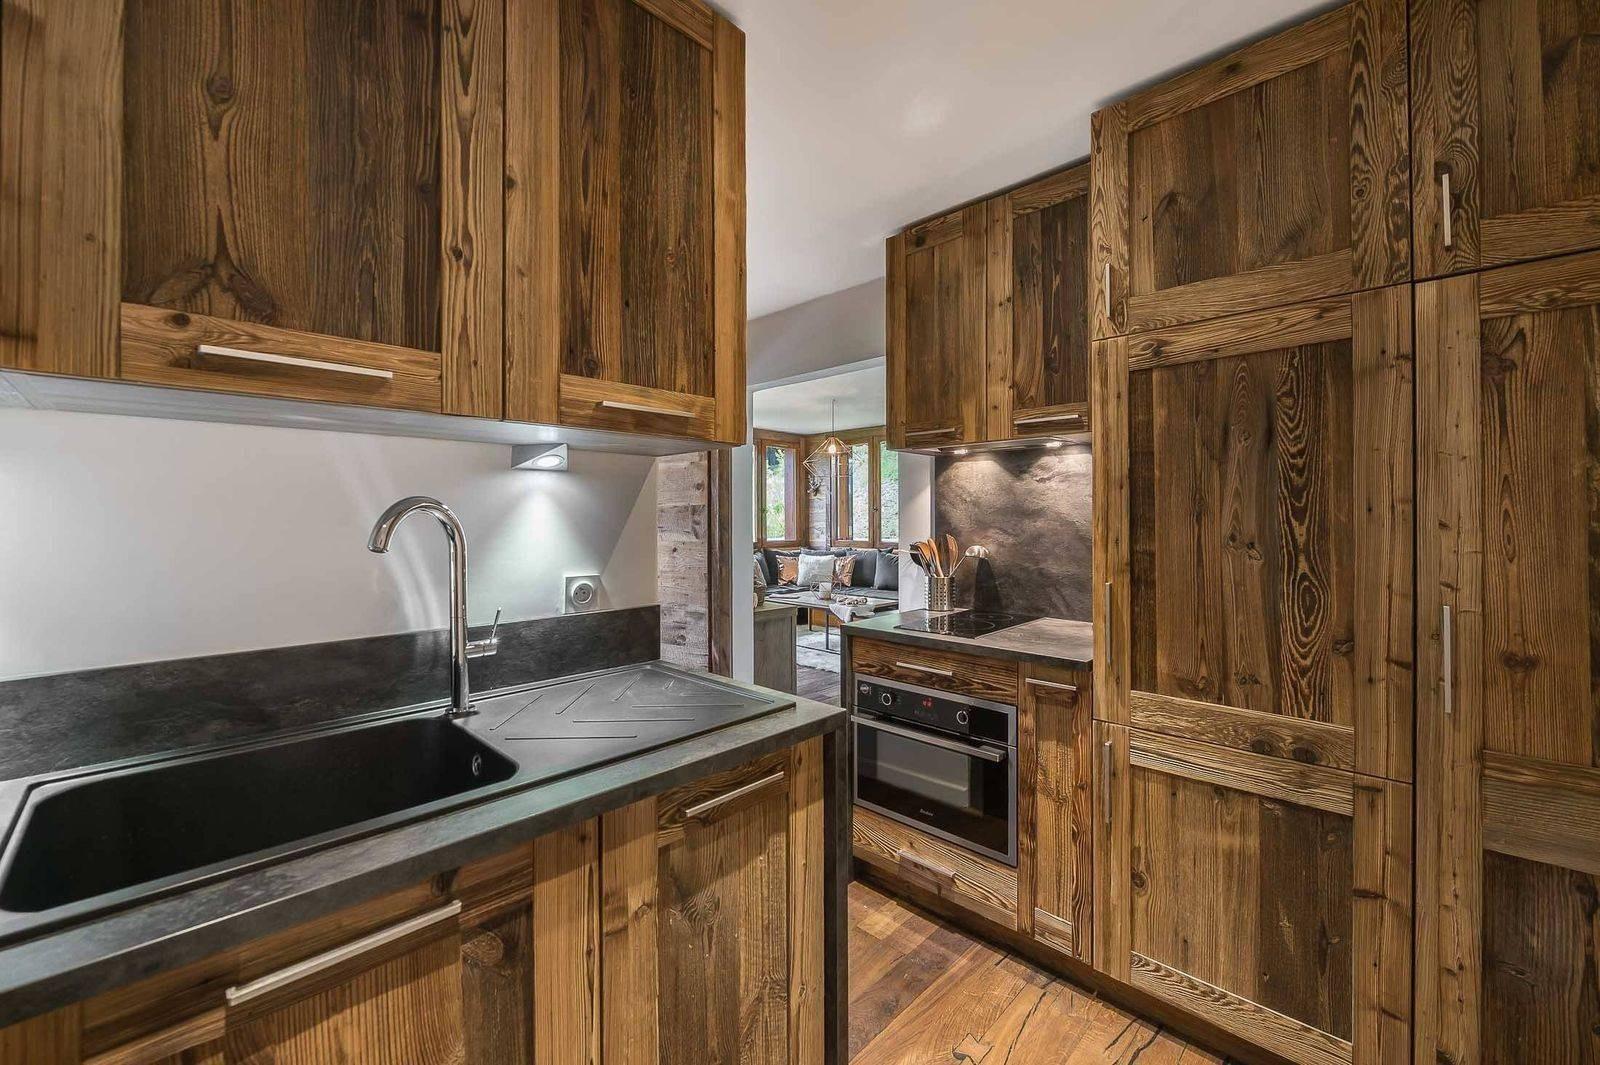 Courchevel 1850 Luxury Rental Appartment Eciello Kitchen